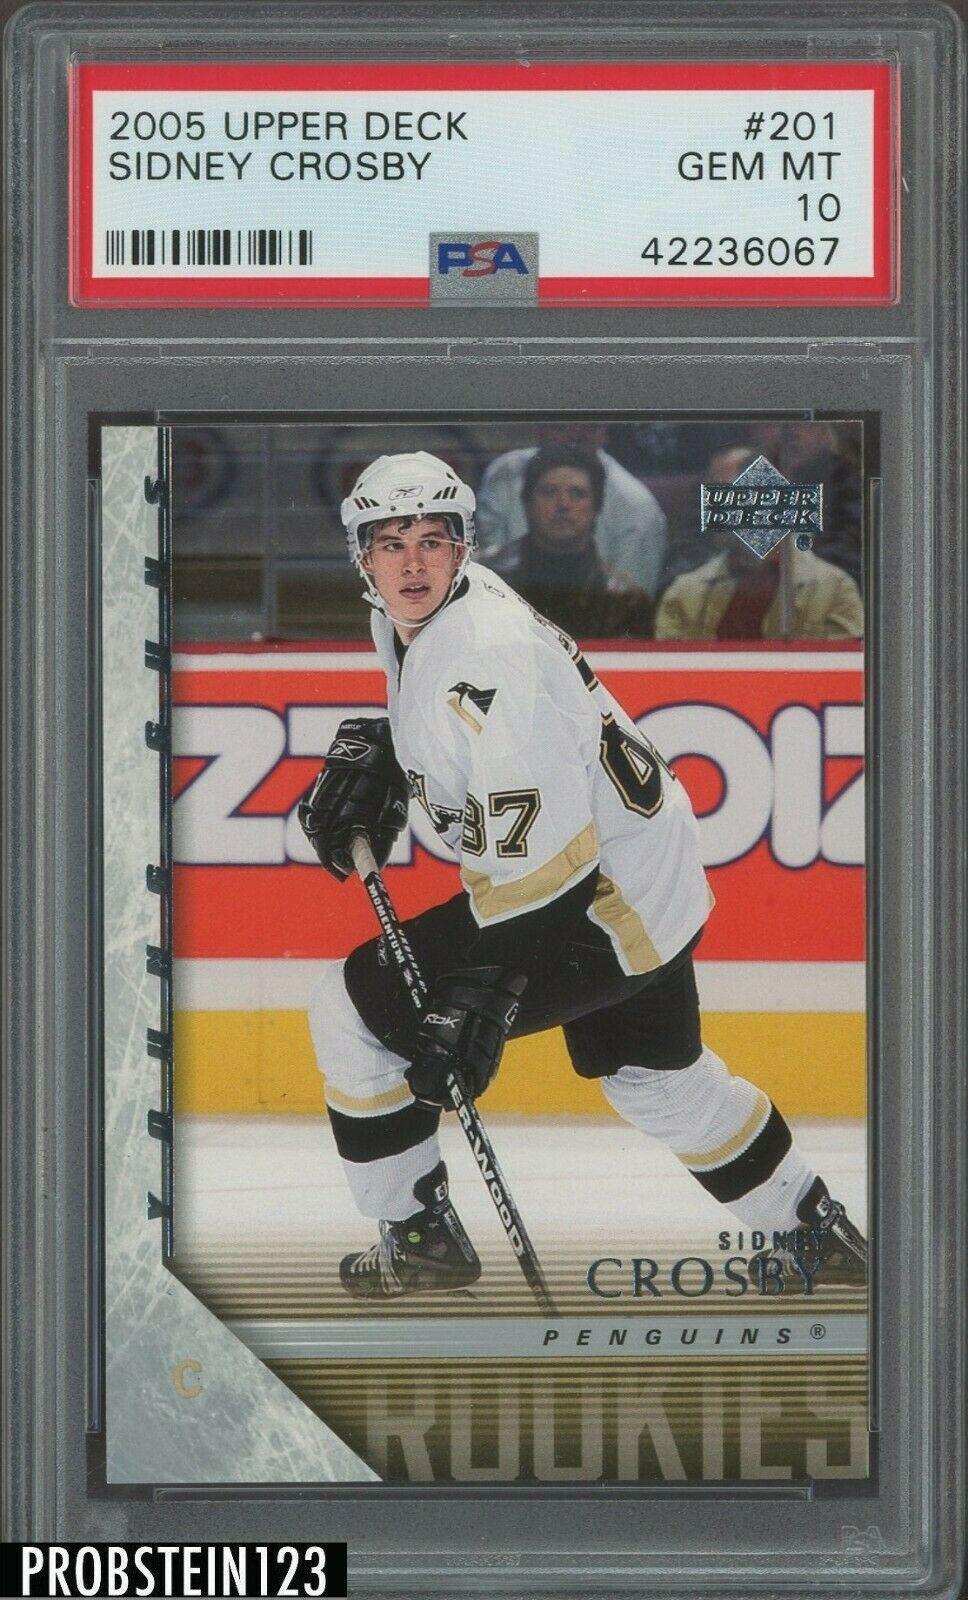 200506 Upper Deck Young Guns 201 Sidney Crosby Penguins